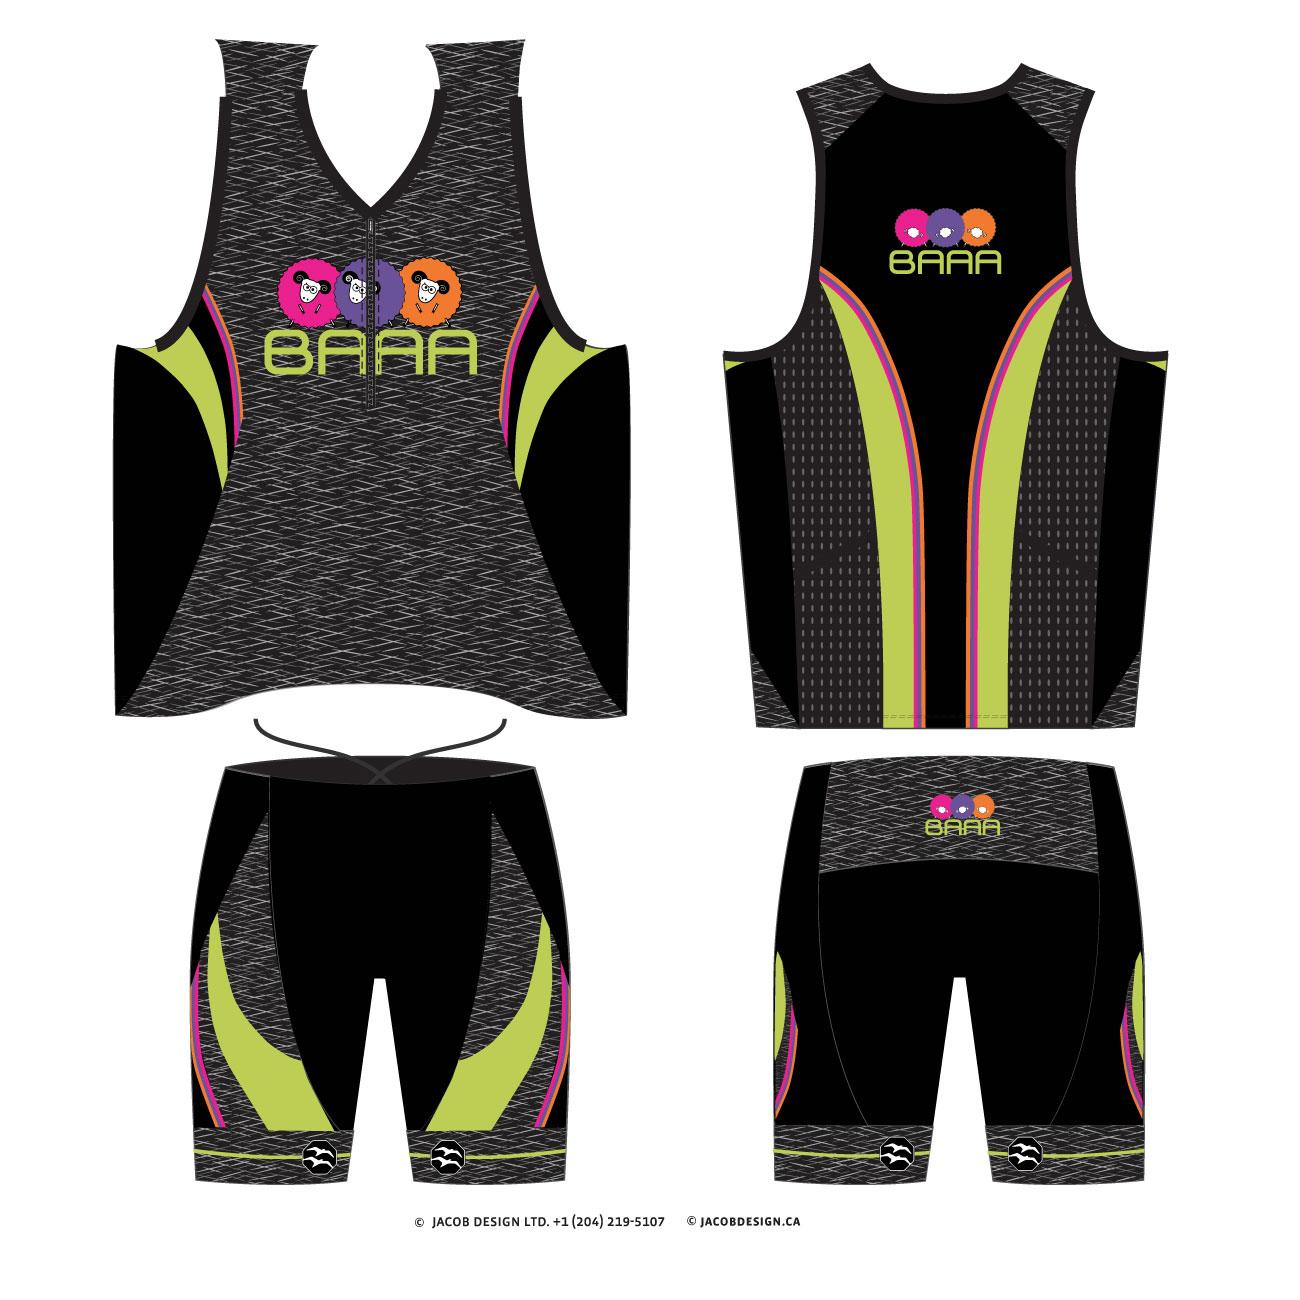 BAAA_Jersey+Shorts.jpg